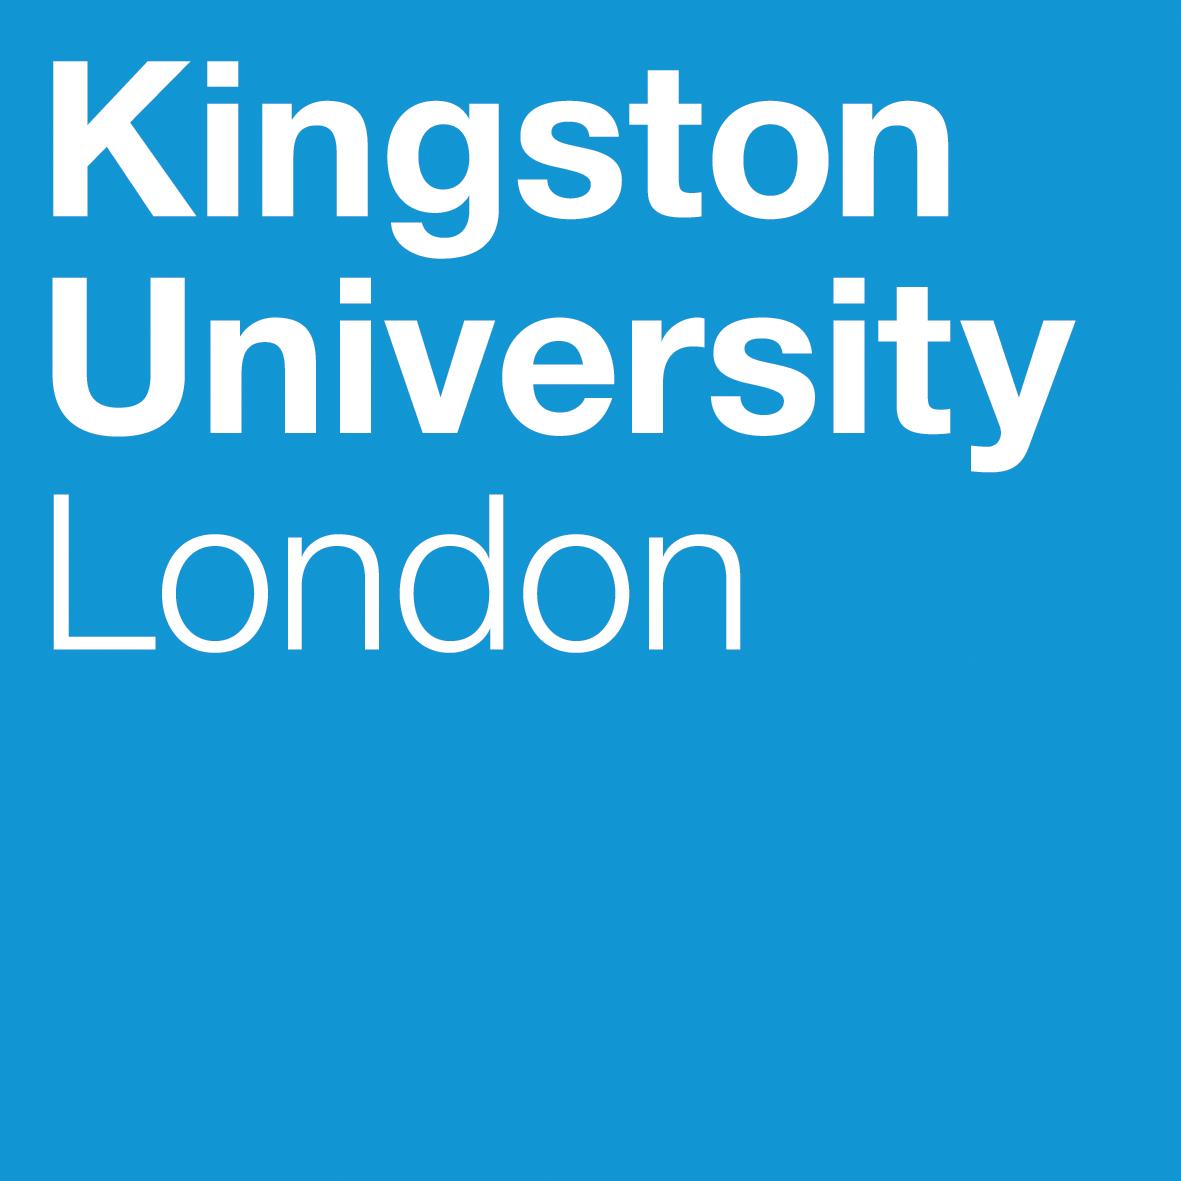 Guide about Kingston University London